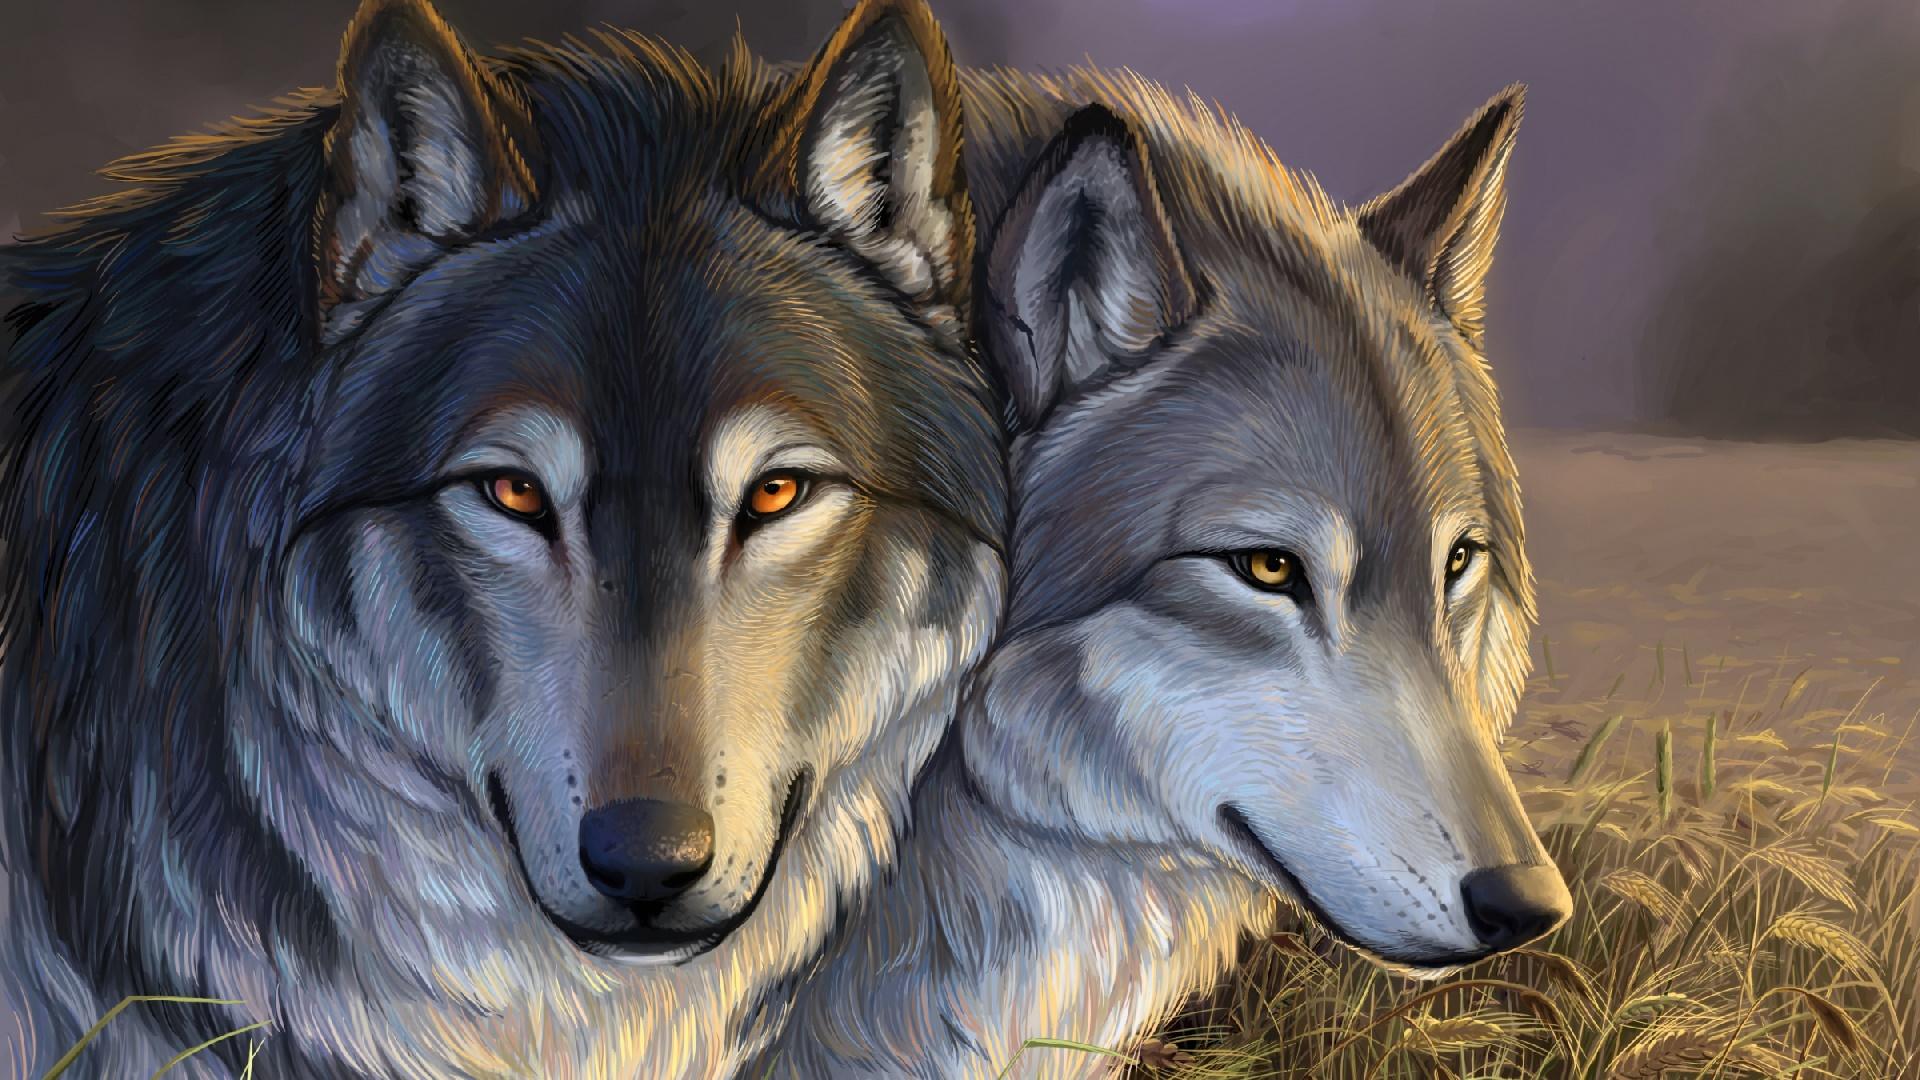 Wolves painting art wallpaper